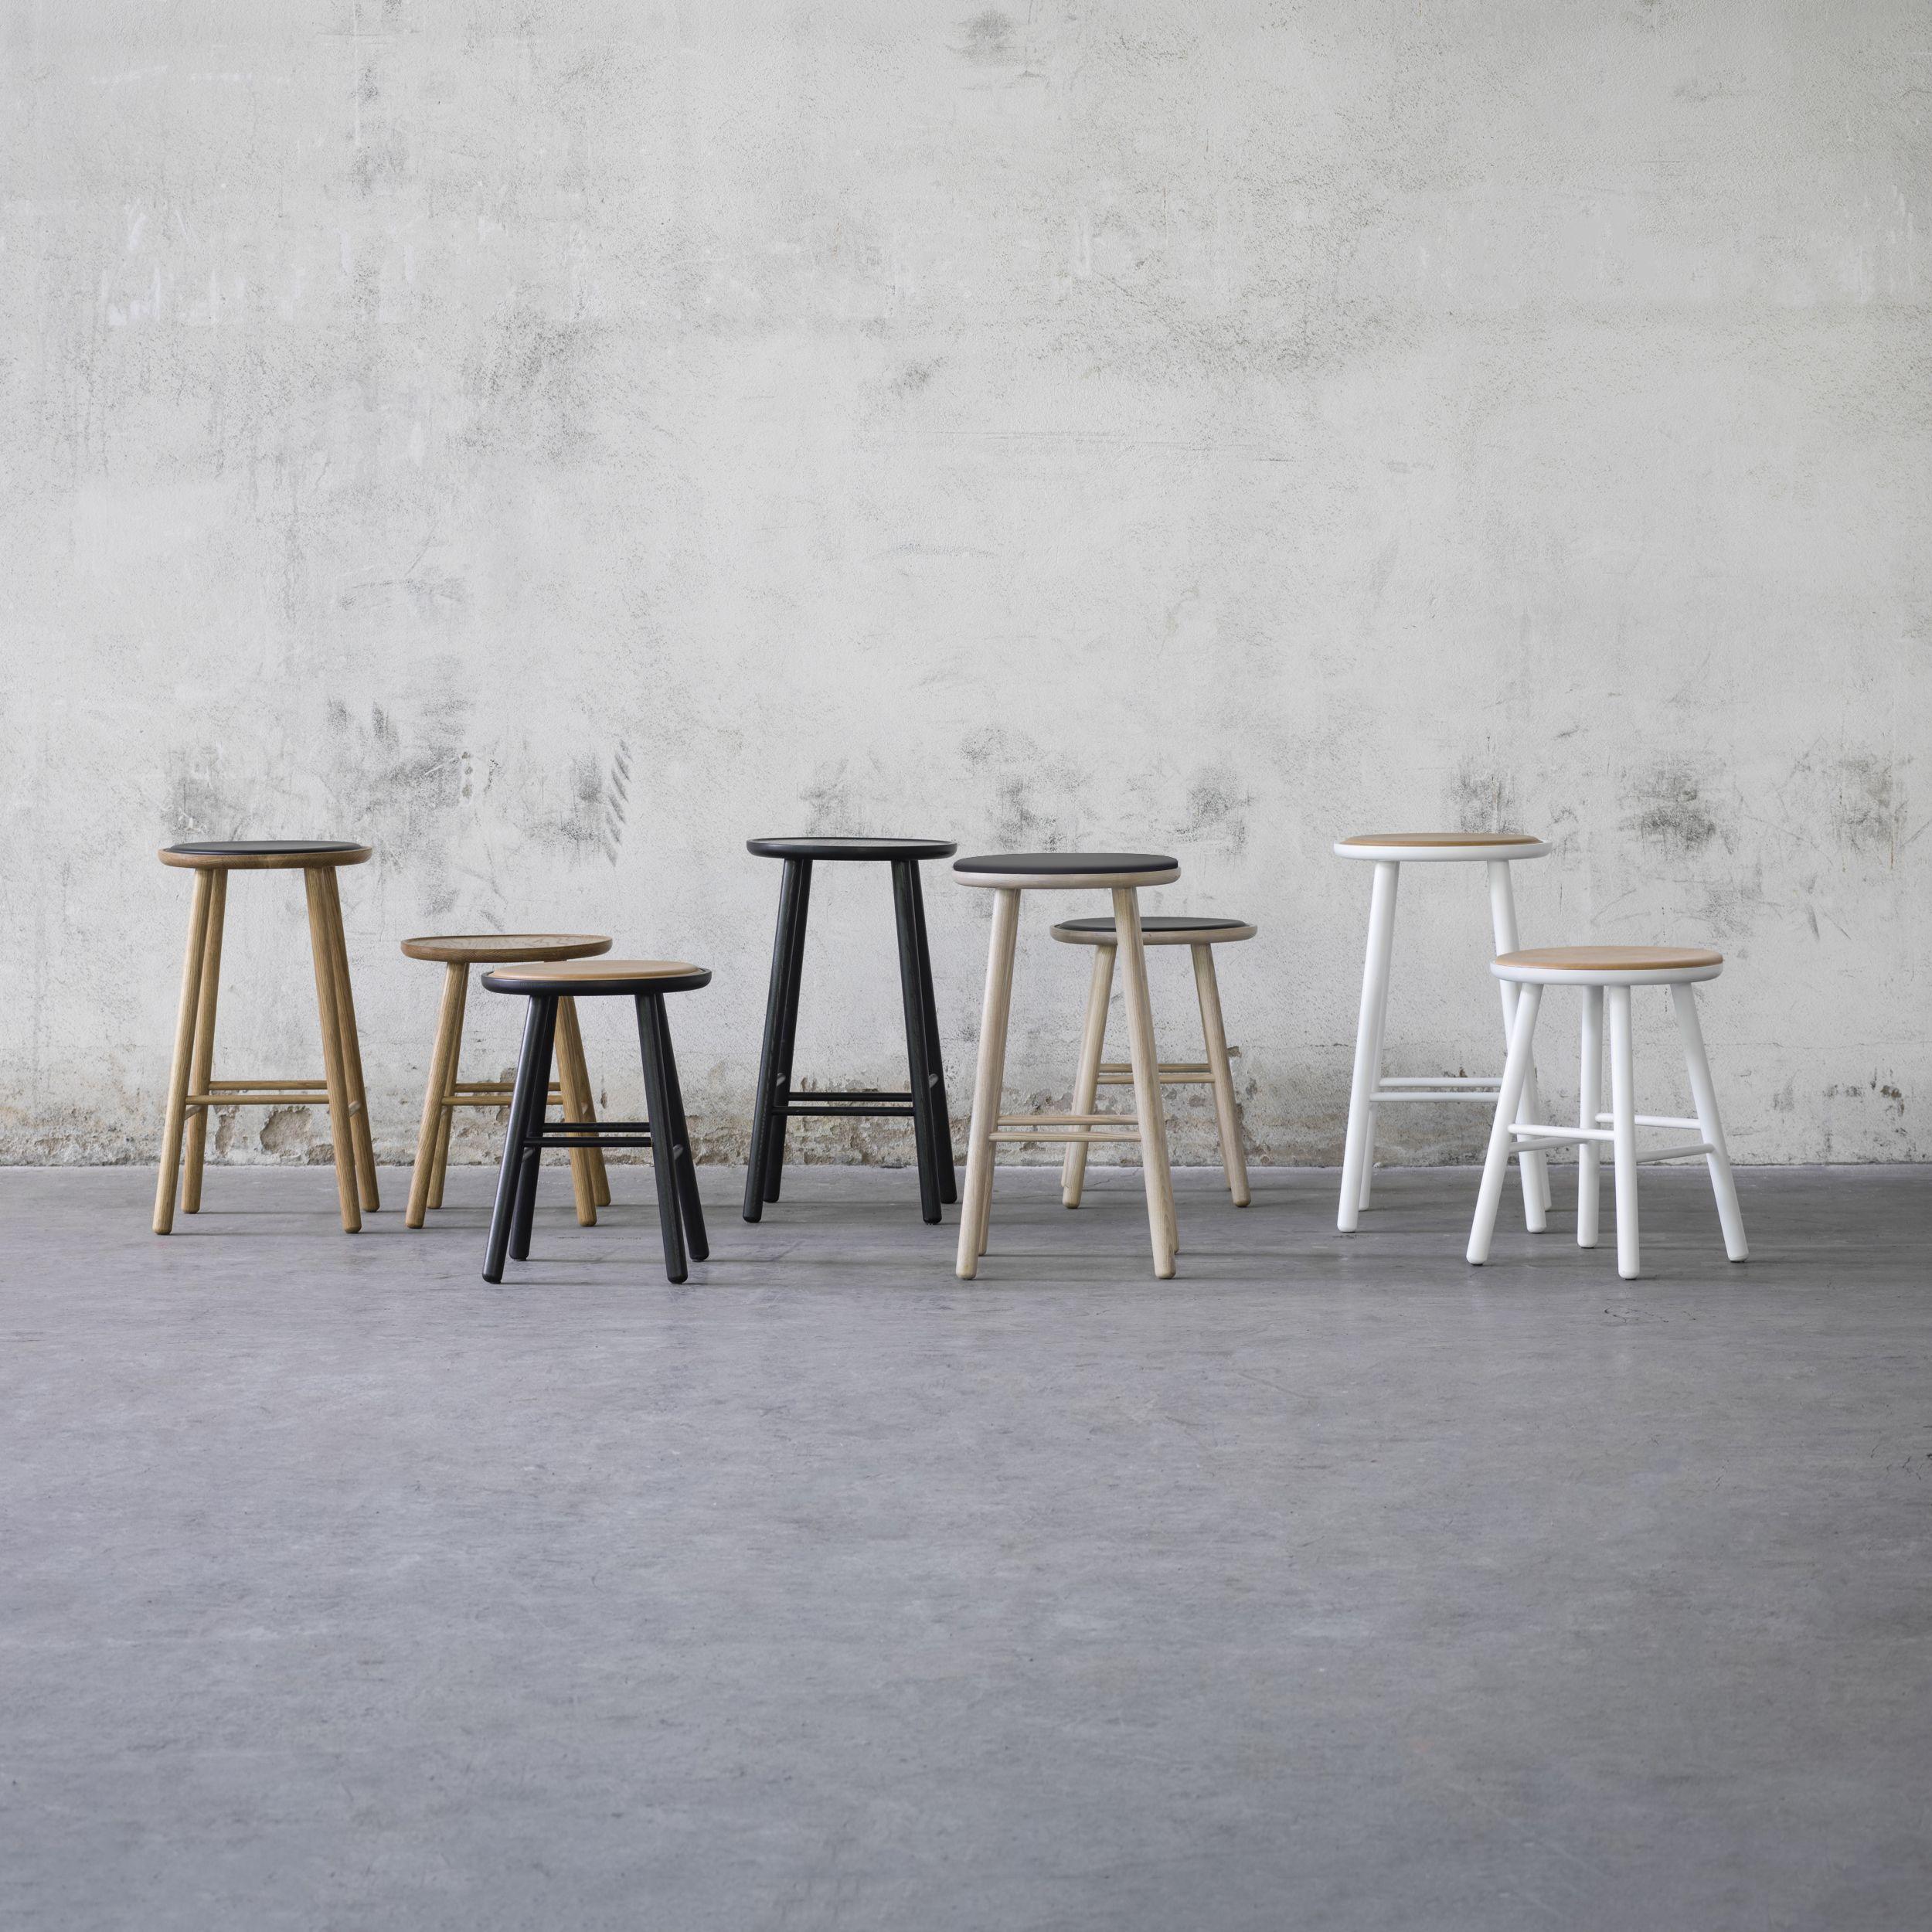 ZigZag Stools in 2020 | Waiting room design, Hallway designs